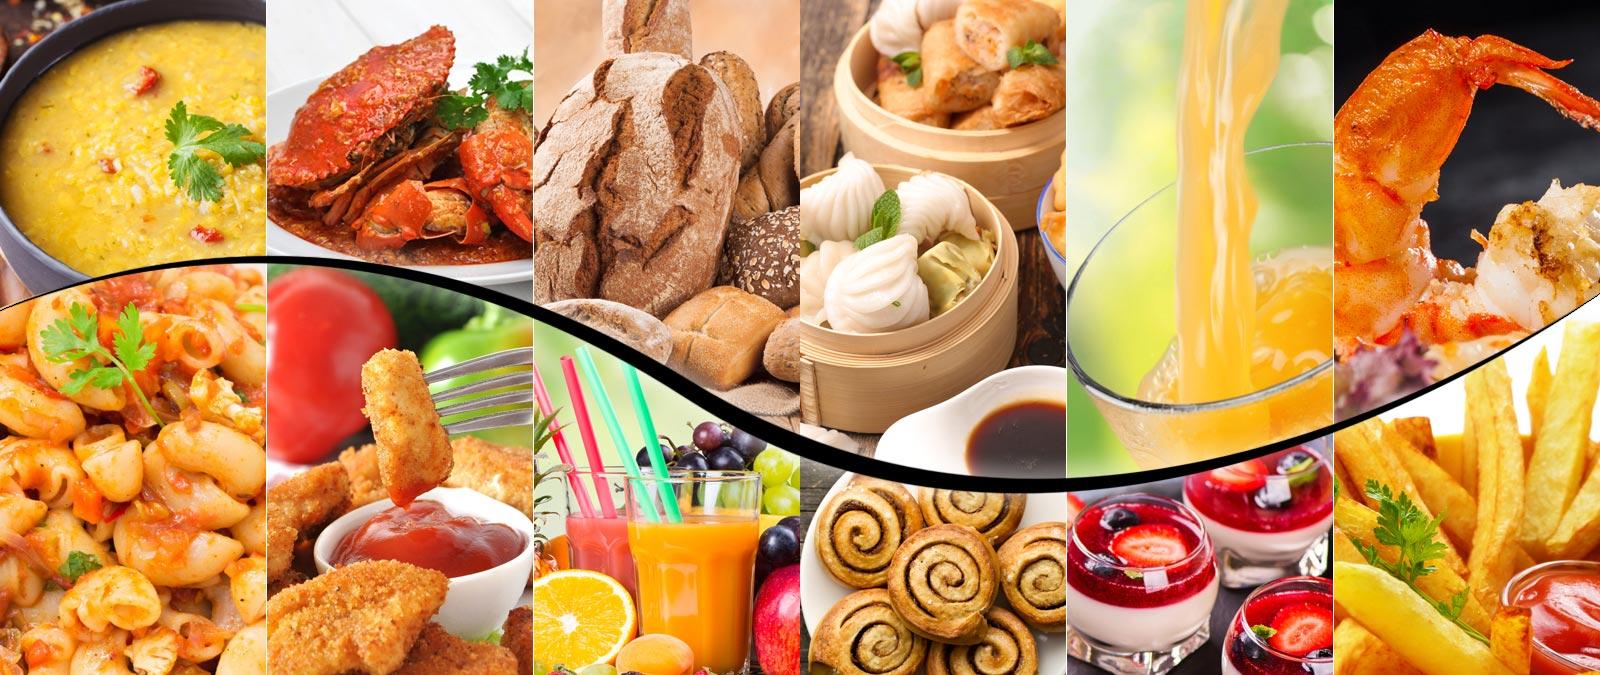 Bestbuy Maldives Distribution & supplier